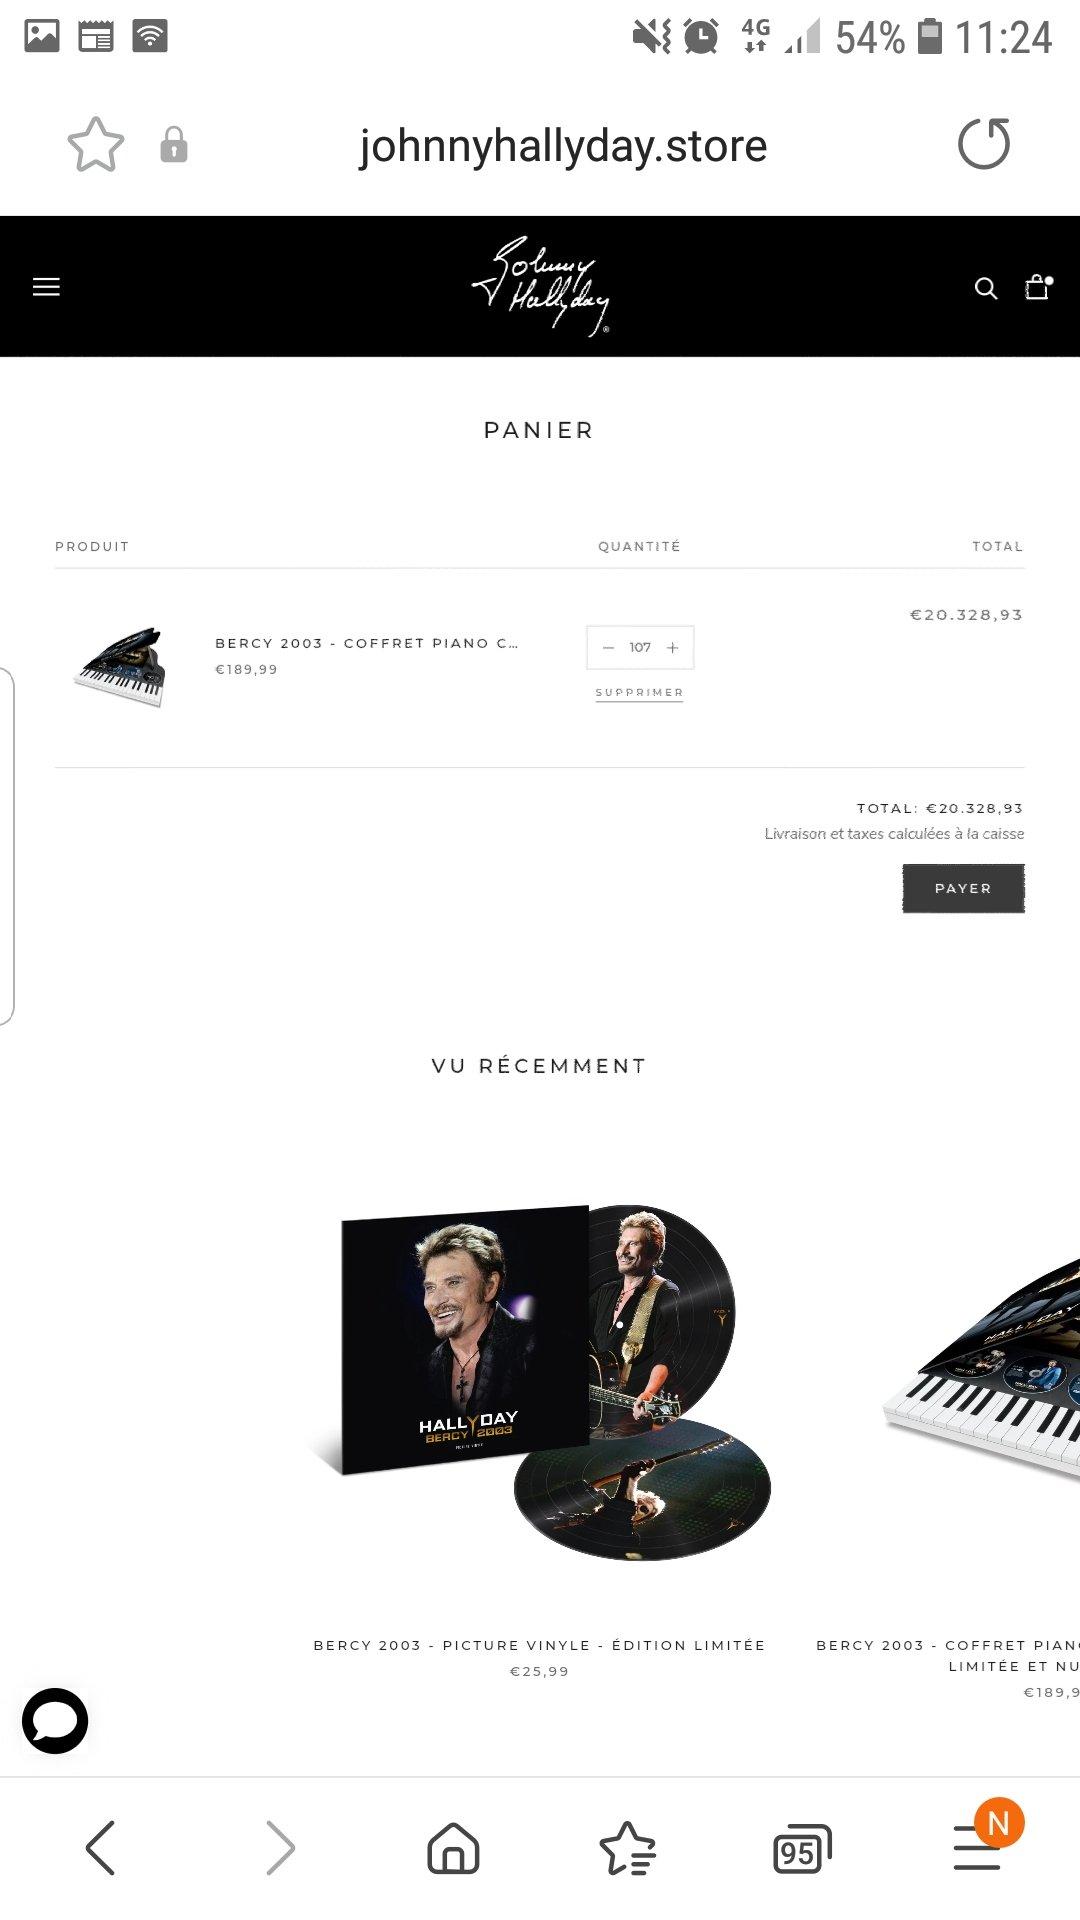 Le coffret piano en feu - Page 2 210607113804117863